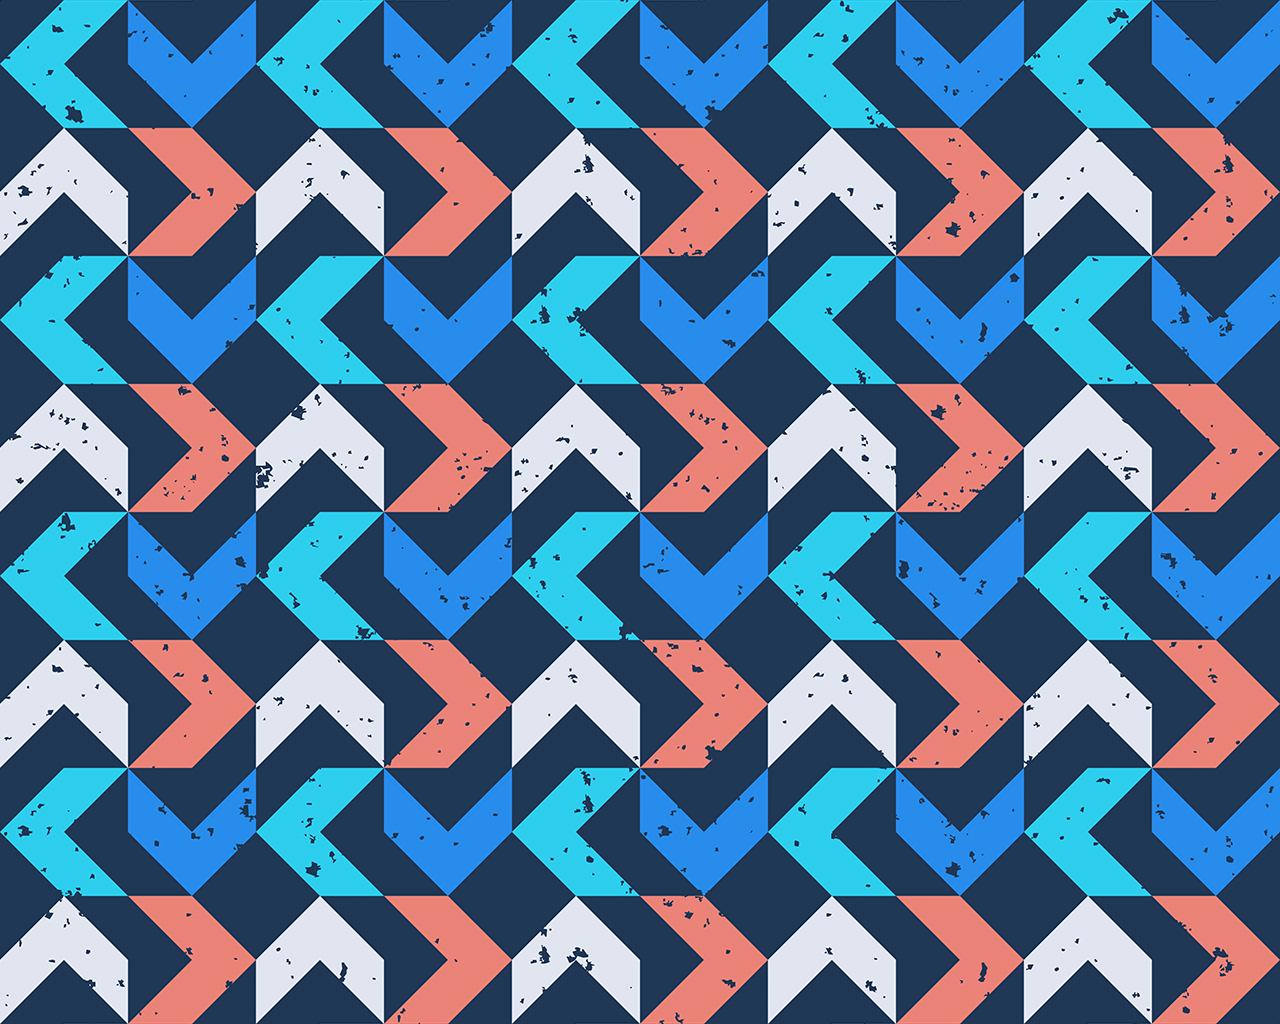 Laptop Wallpapers Fall Vo74 Retro Red Blue Pattern Grunge Wallpaper